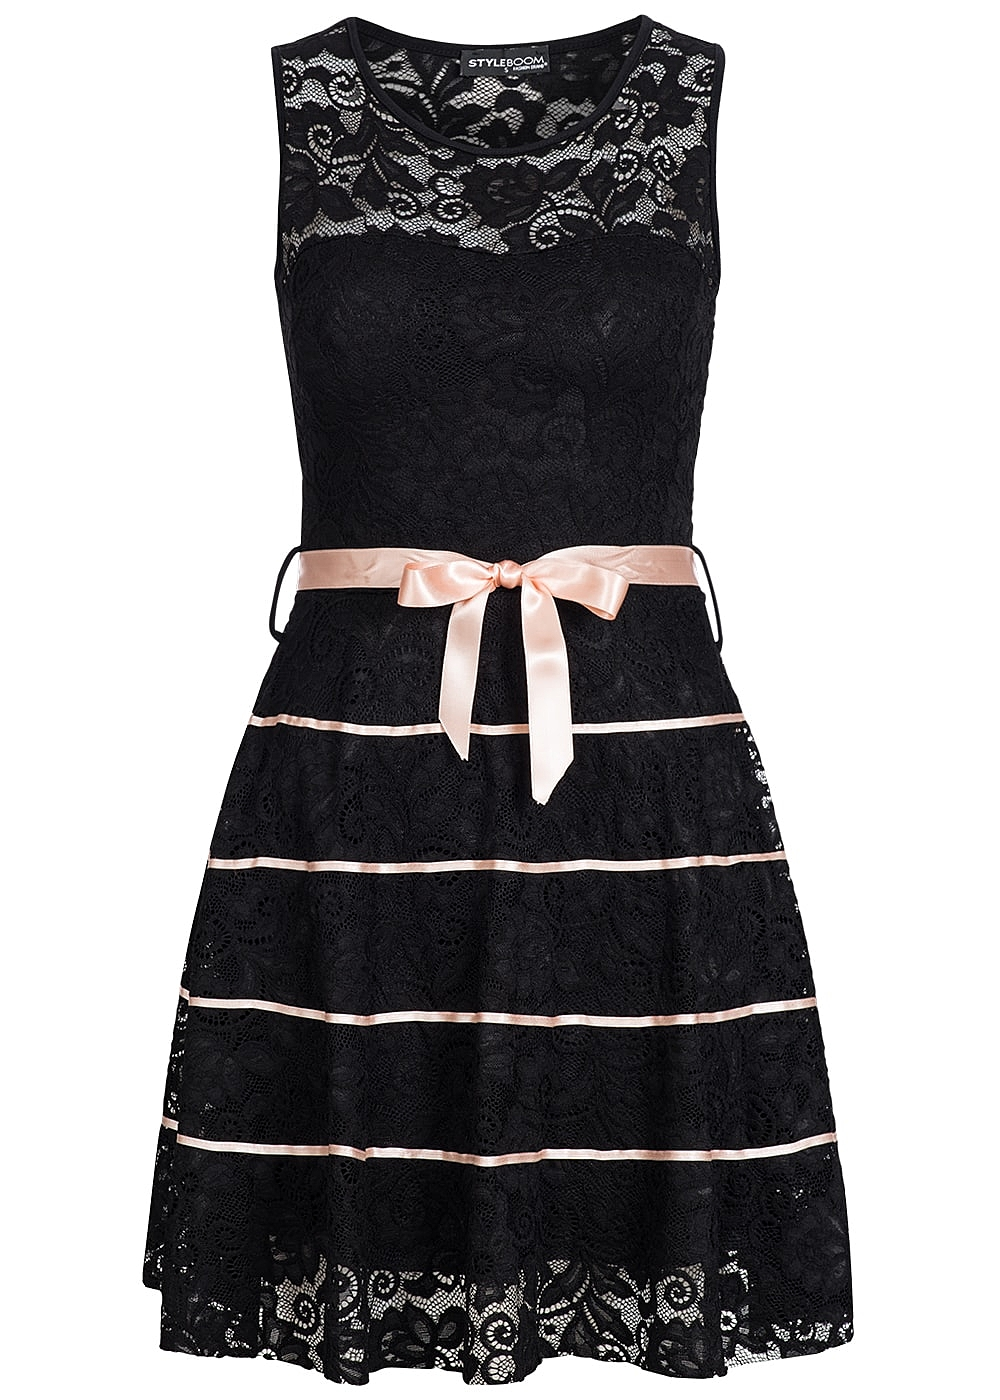 styleboom fashion damen mini kleid brustpads spitze all over schleife schwarz rosa 77onlineshop. Black Bedroom Furniture Sets. Home Design Ideas